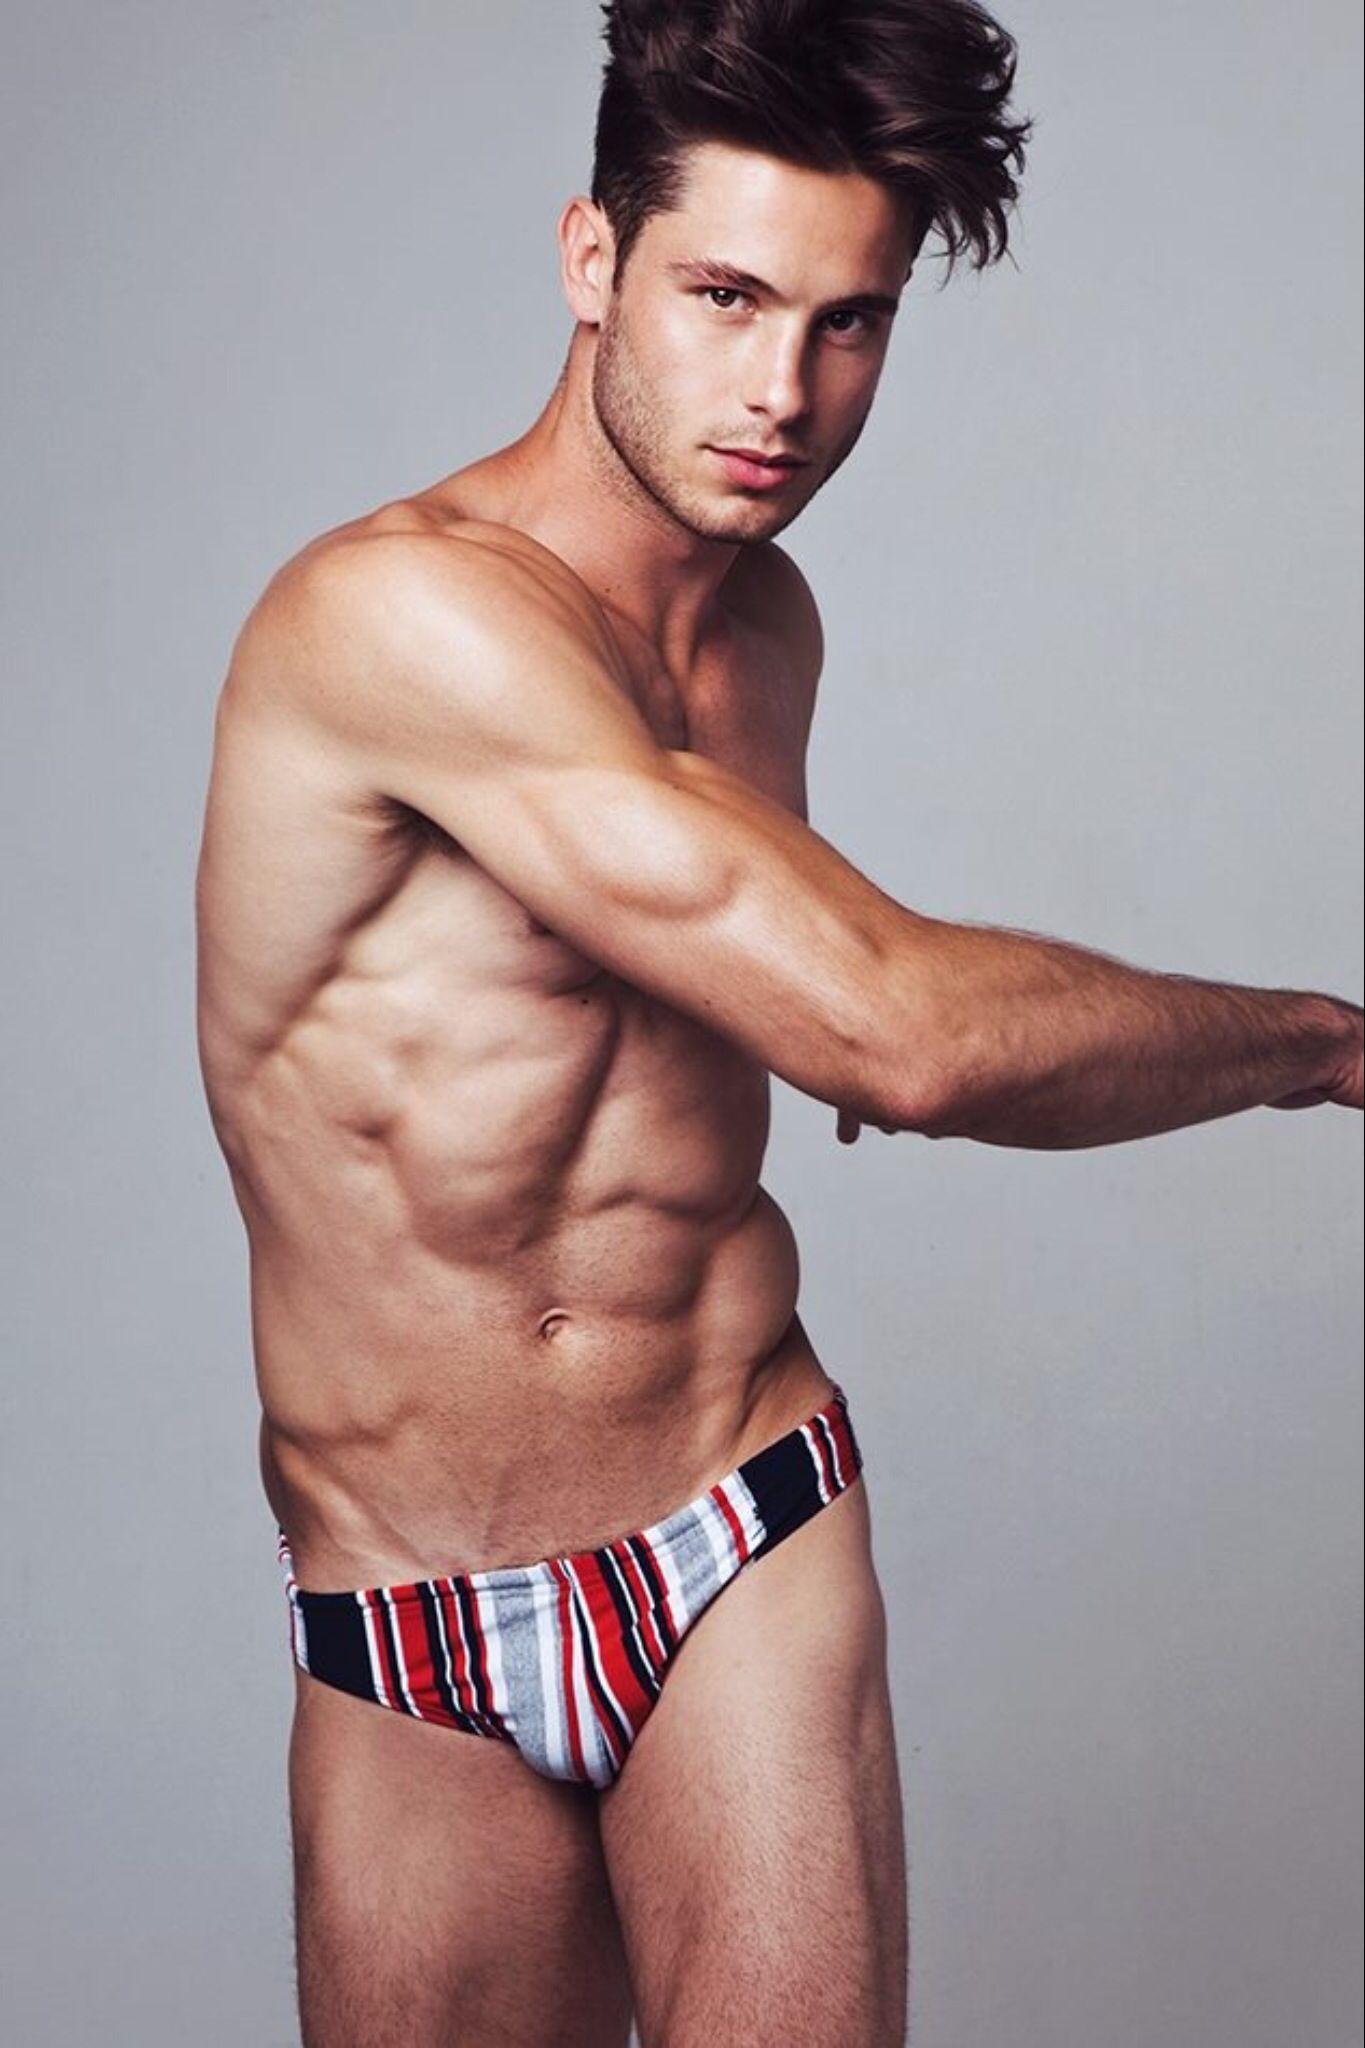 35a1ea7ee5b69 Ethan Turnbull Traje De Baño Hombre, Trajes, Espectaculares, Hombres Sin  Camisa, Ropa